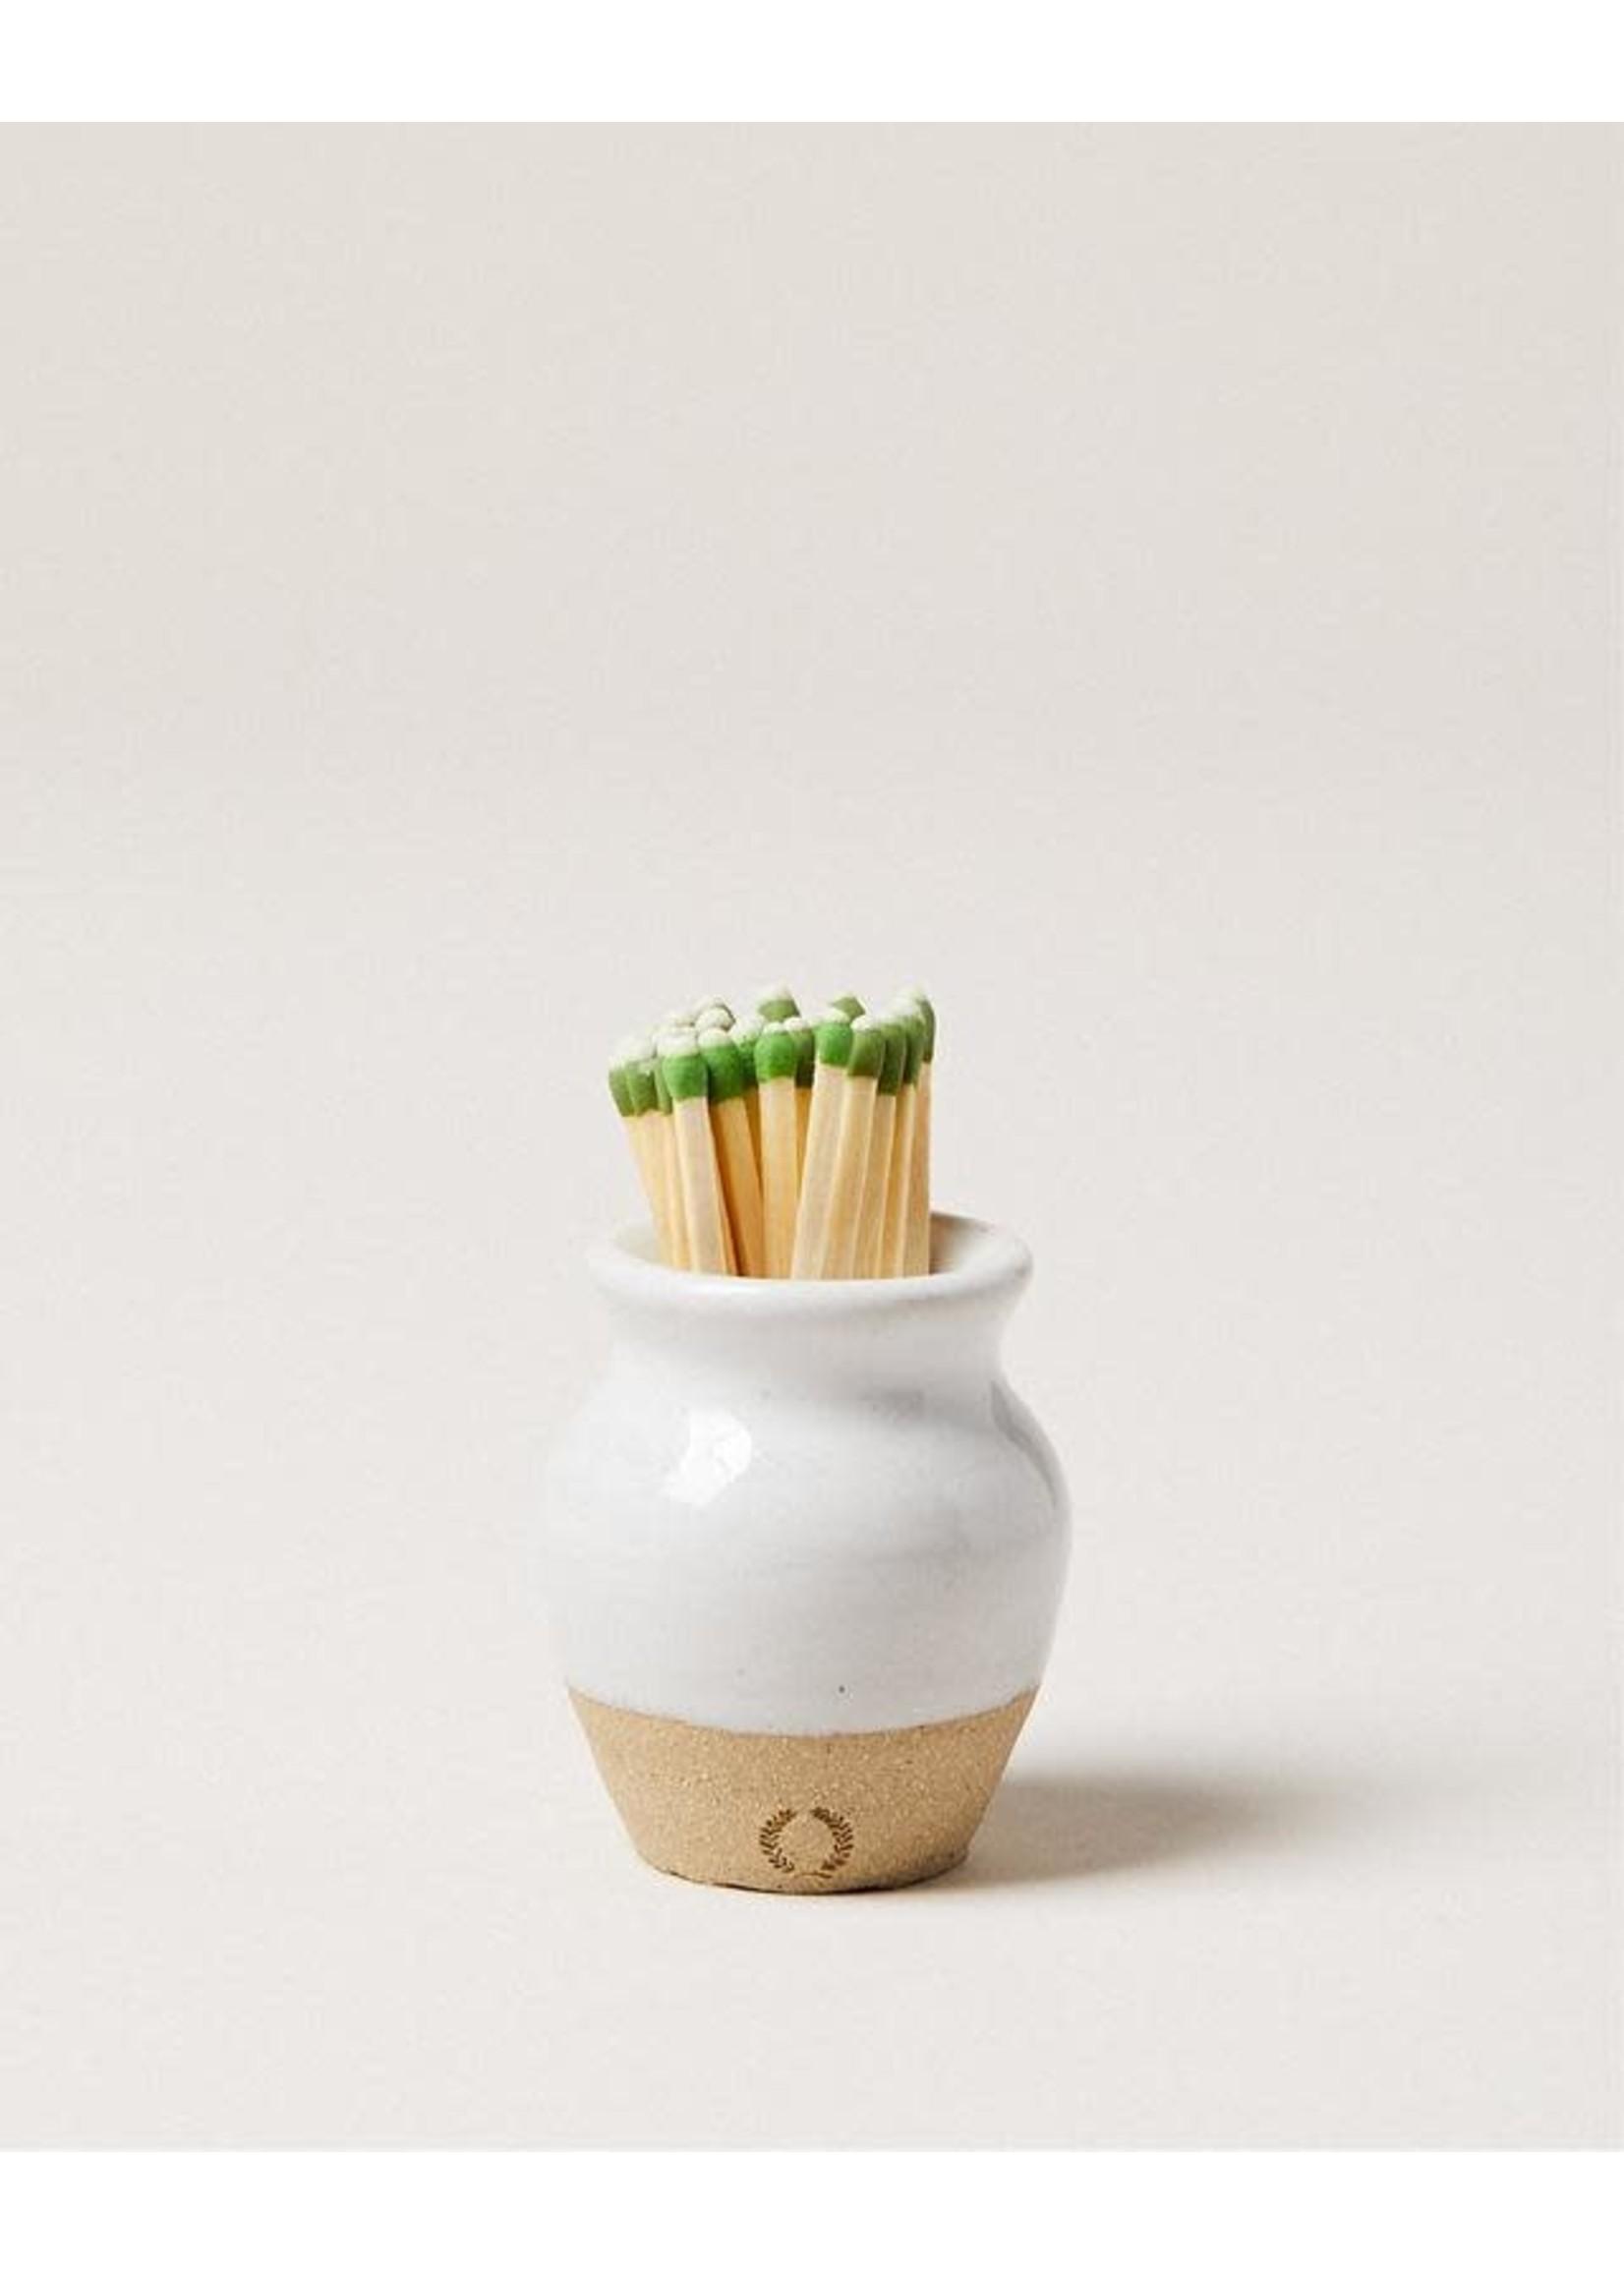 Farmhouse Pottery Match Striker - Confit